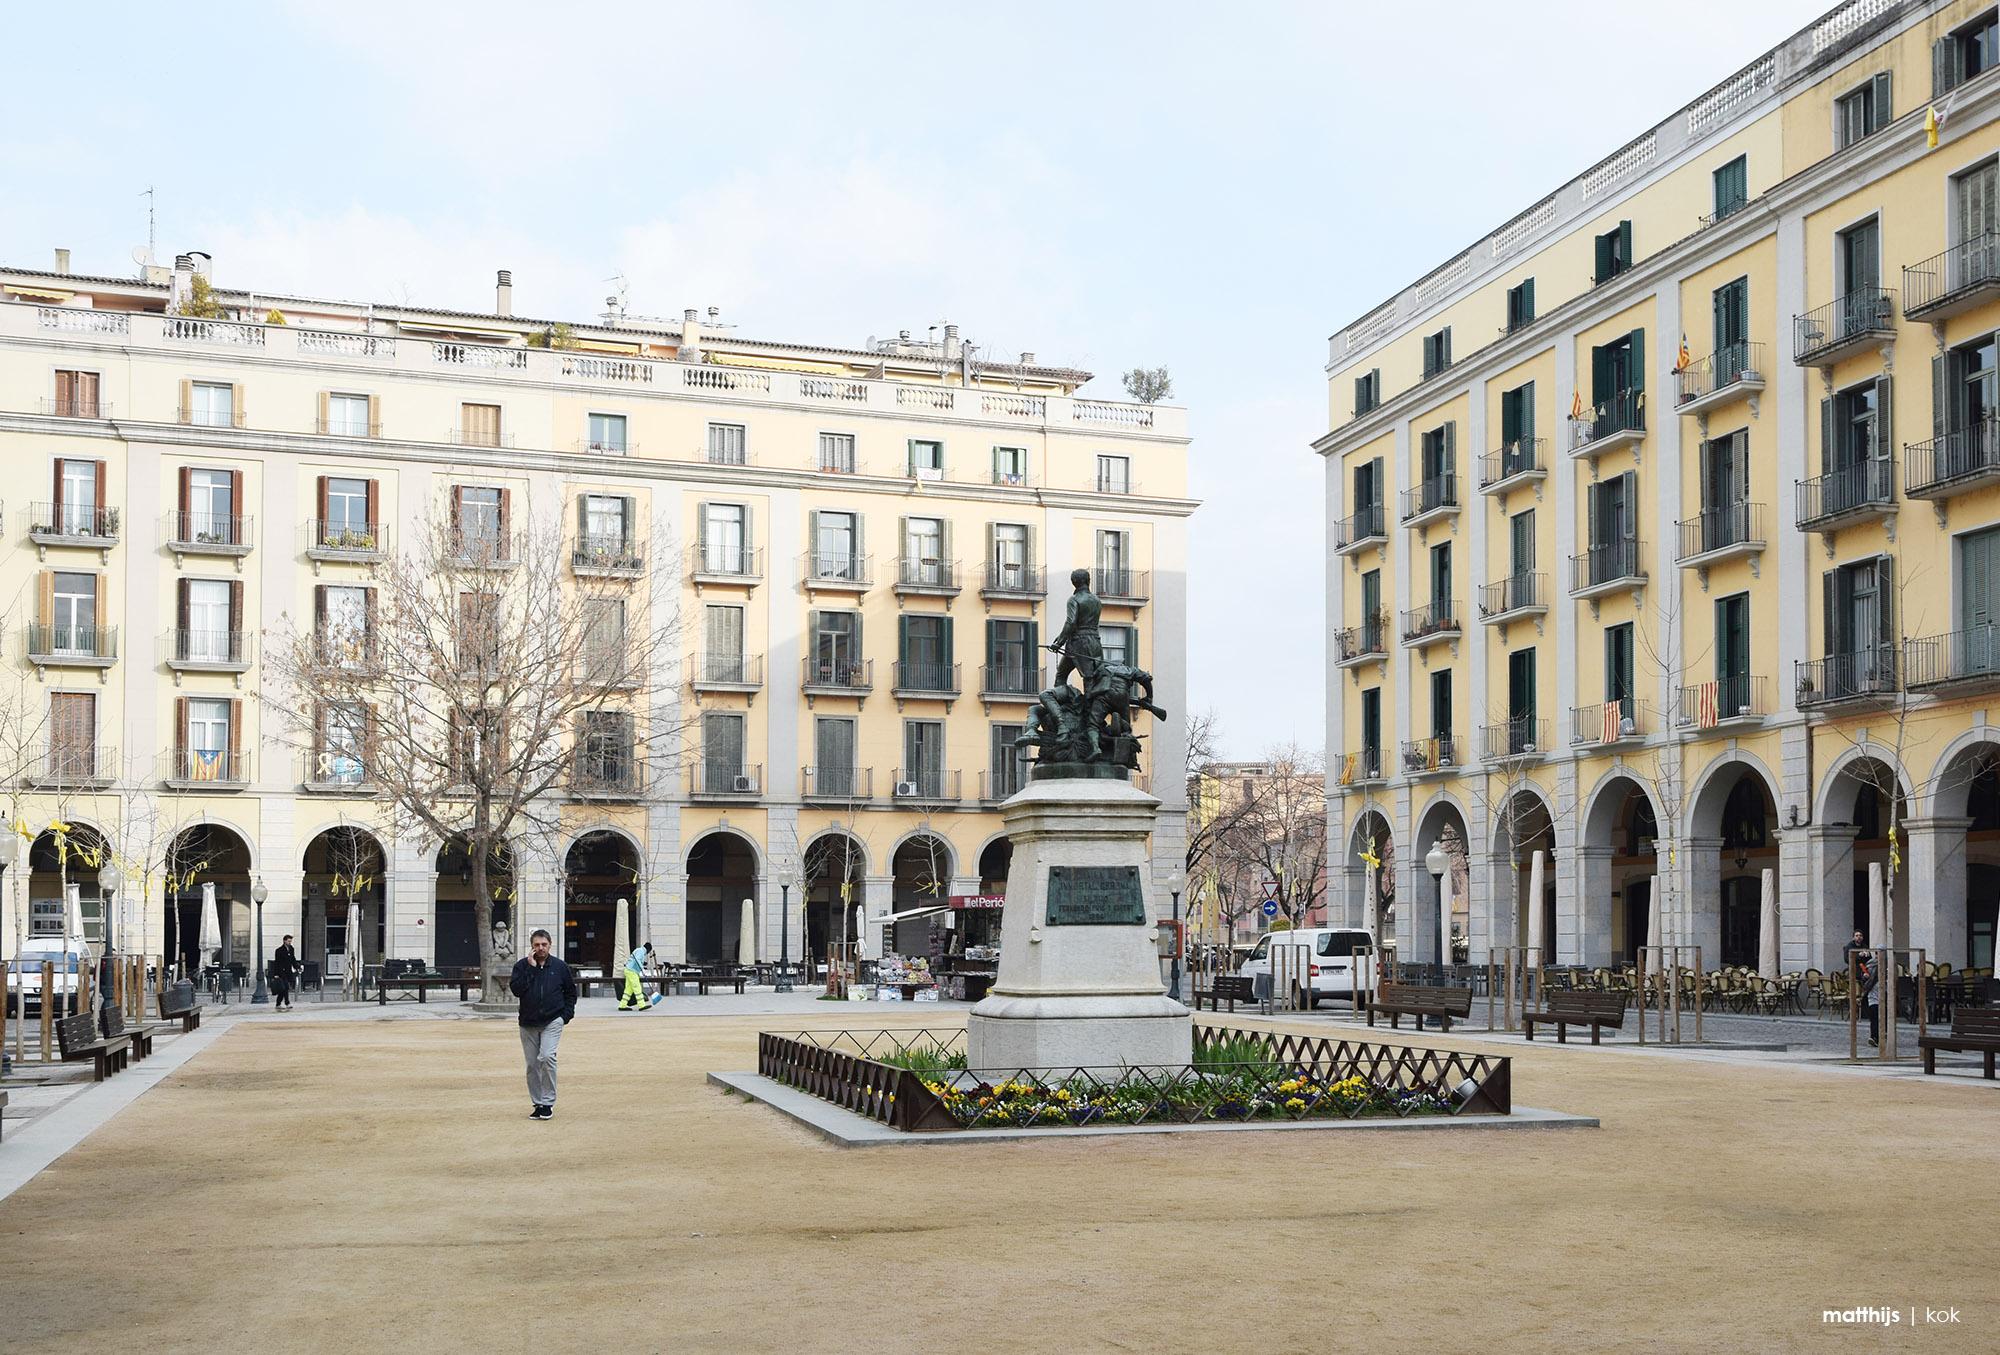 Plaça de la Independència, Girona, Spain | Photo by Matthijs Kok